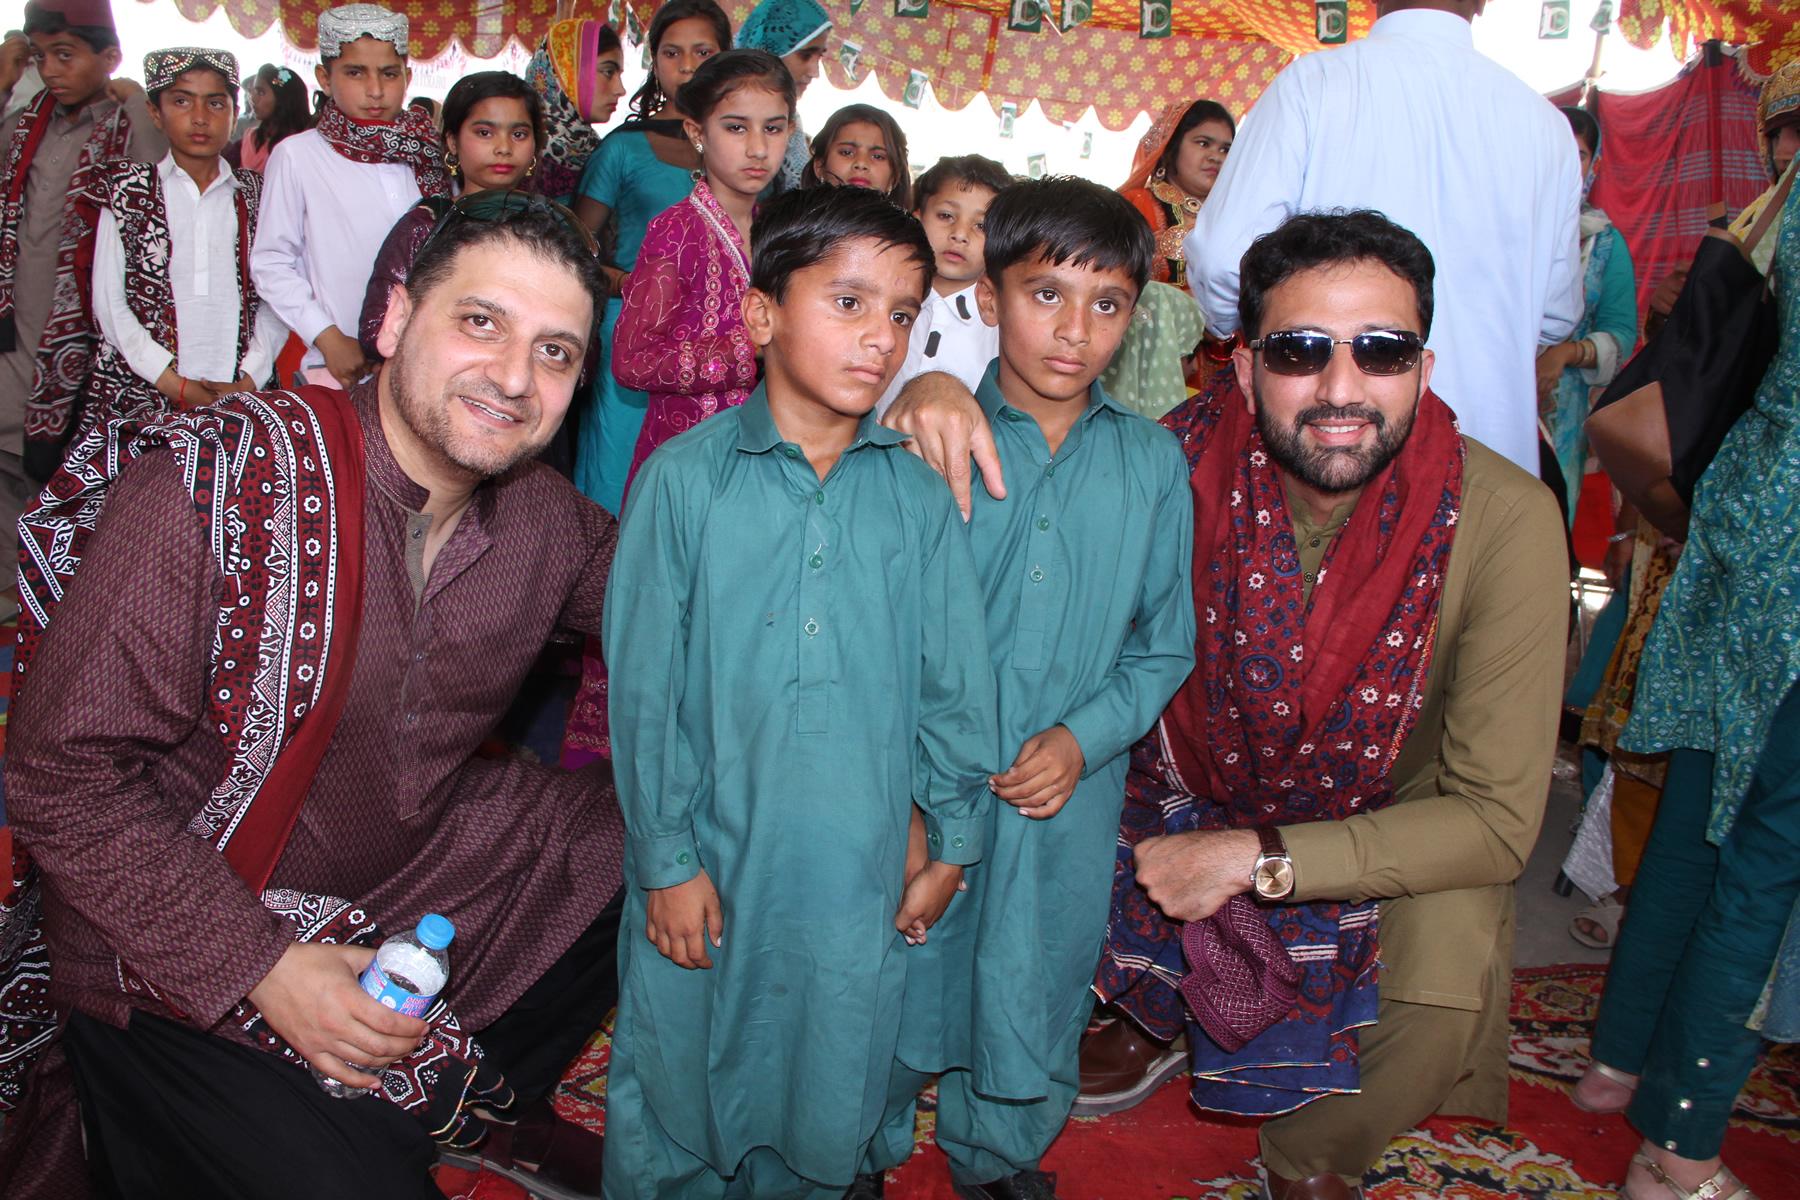 Muslim Charity Appeals